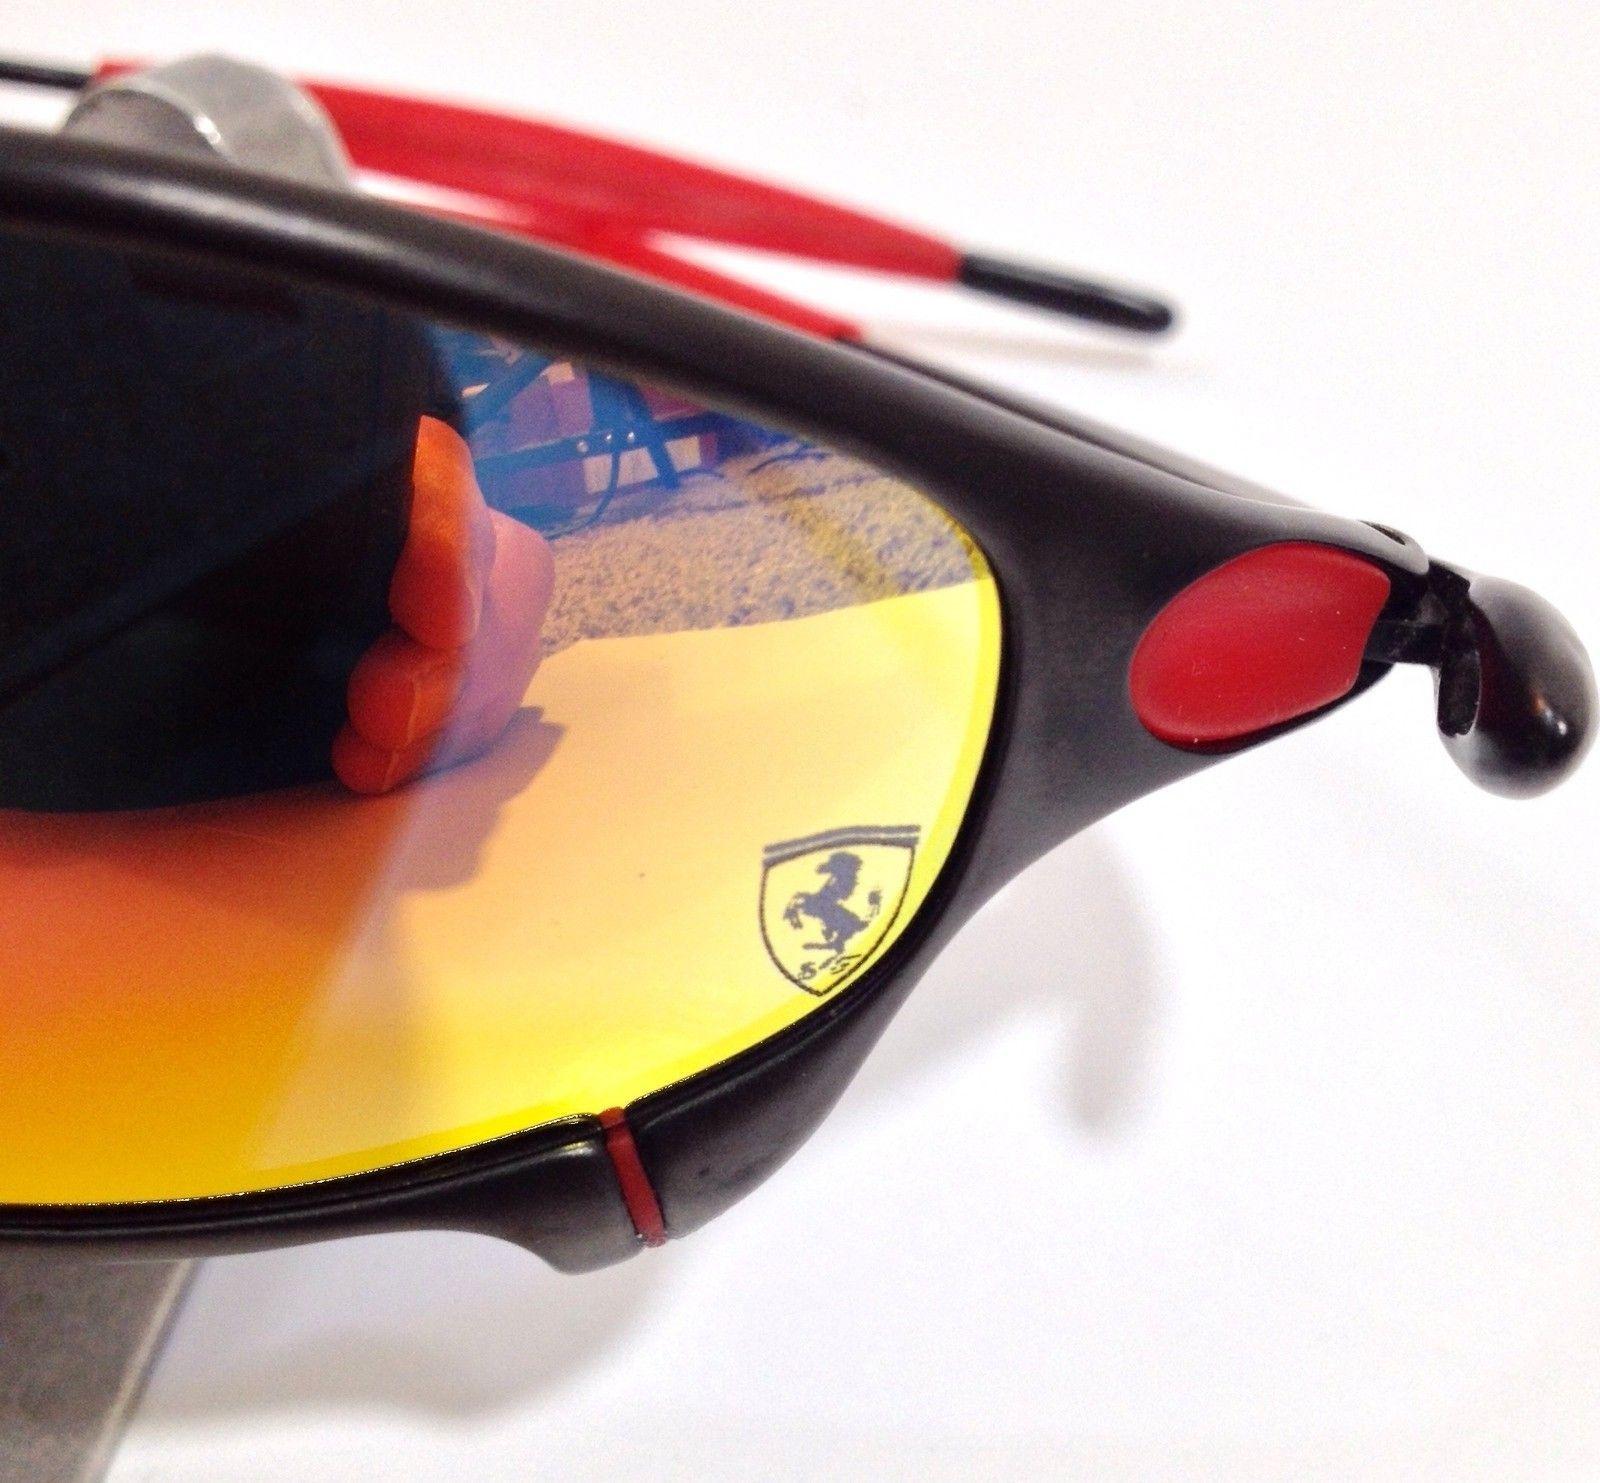 What Ferrari Juliet should be ;) - image.jpeg